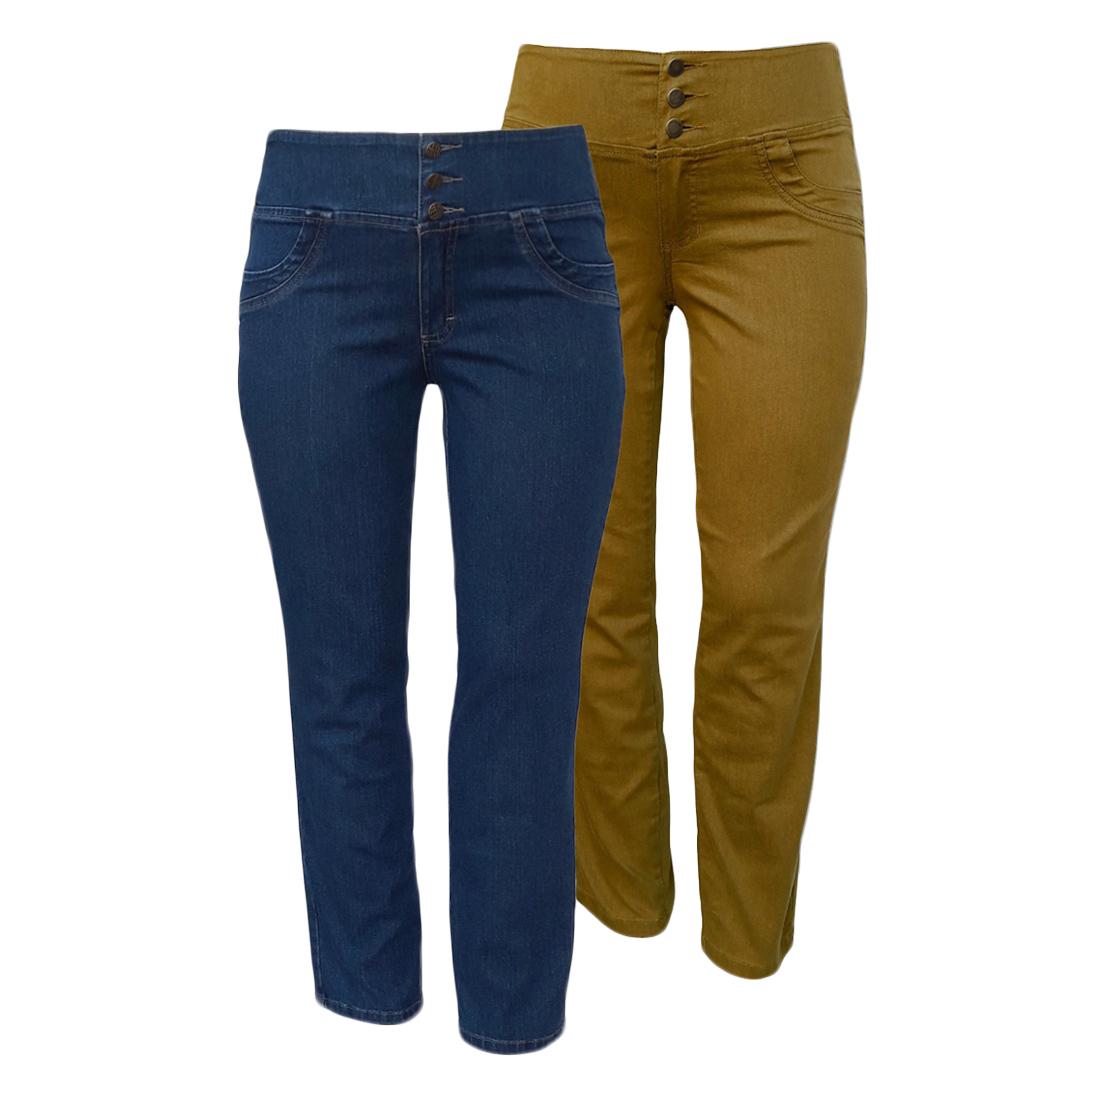 Calça Jeans Feminina Elástico Cós Traseiro Plus Size